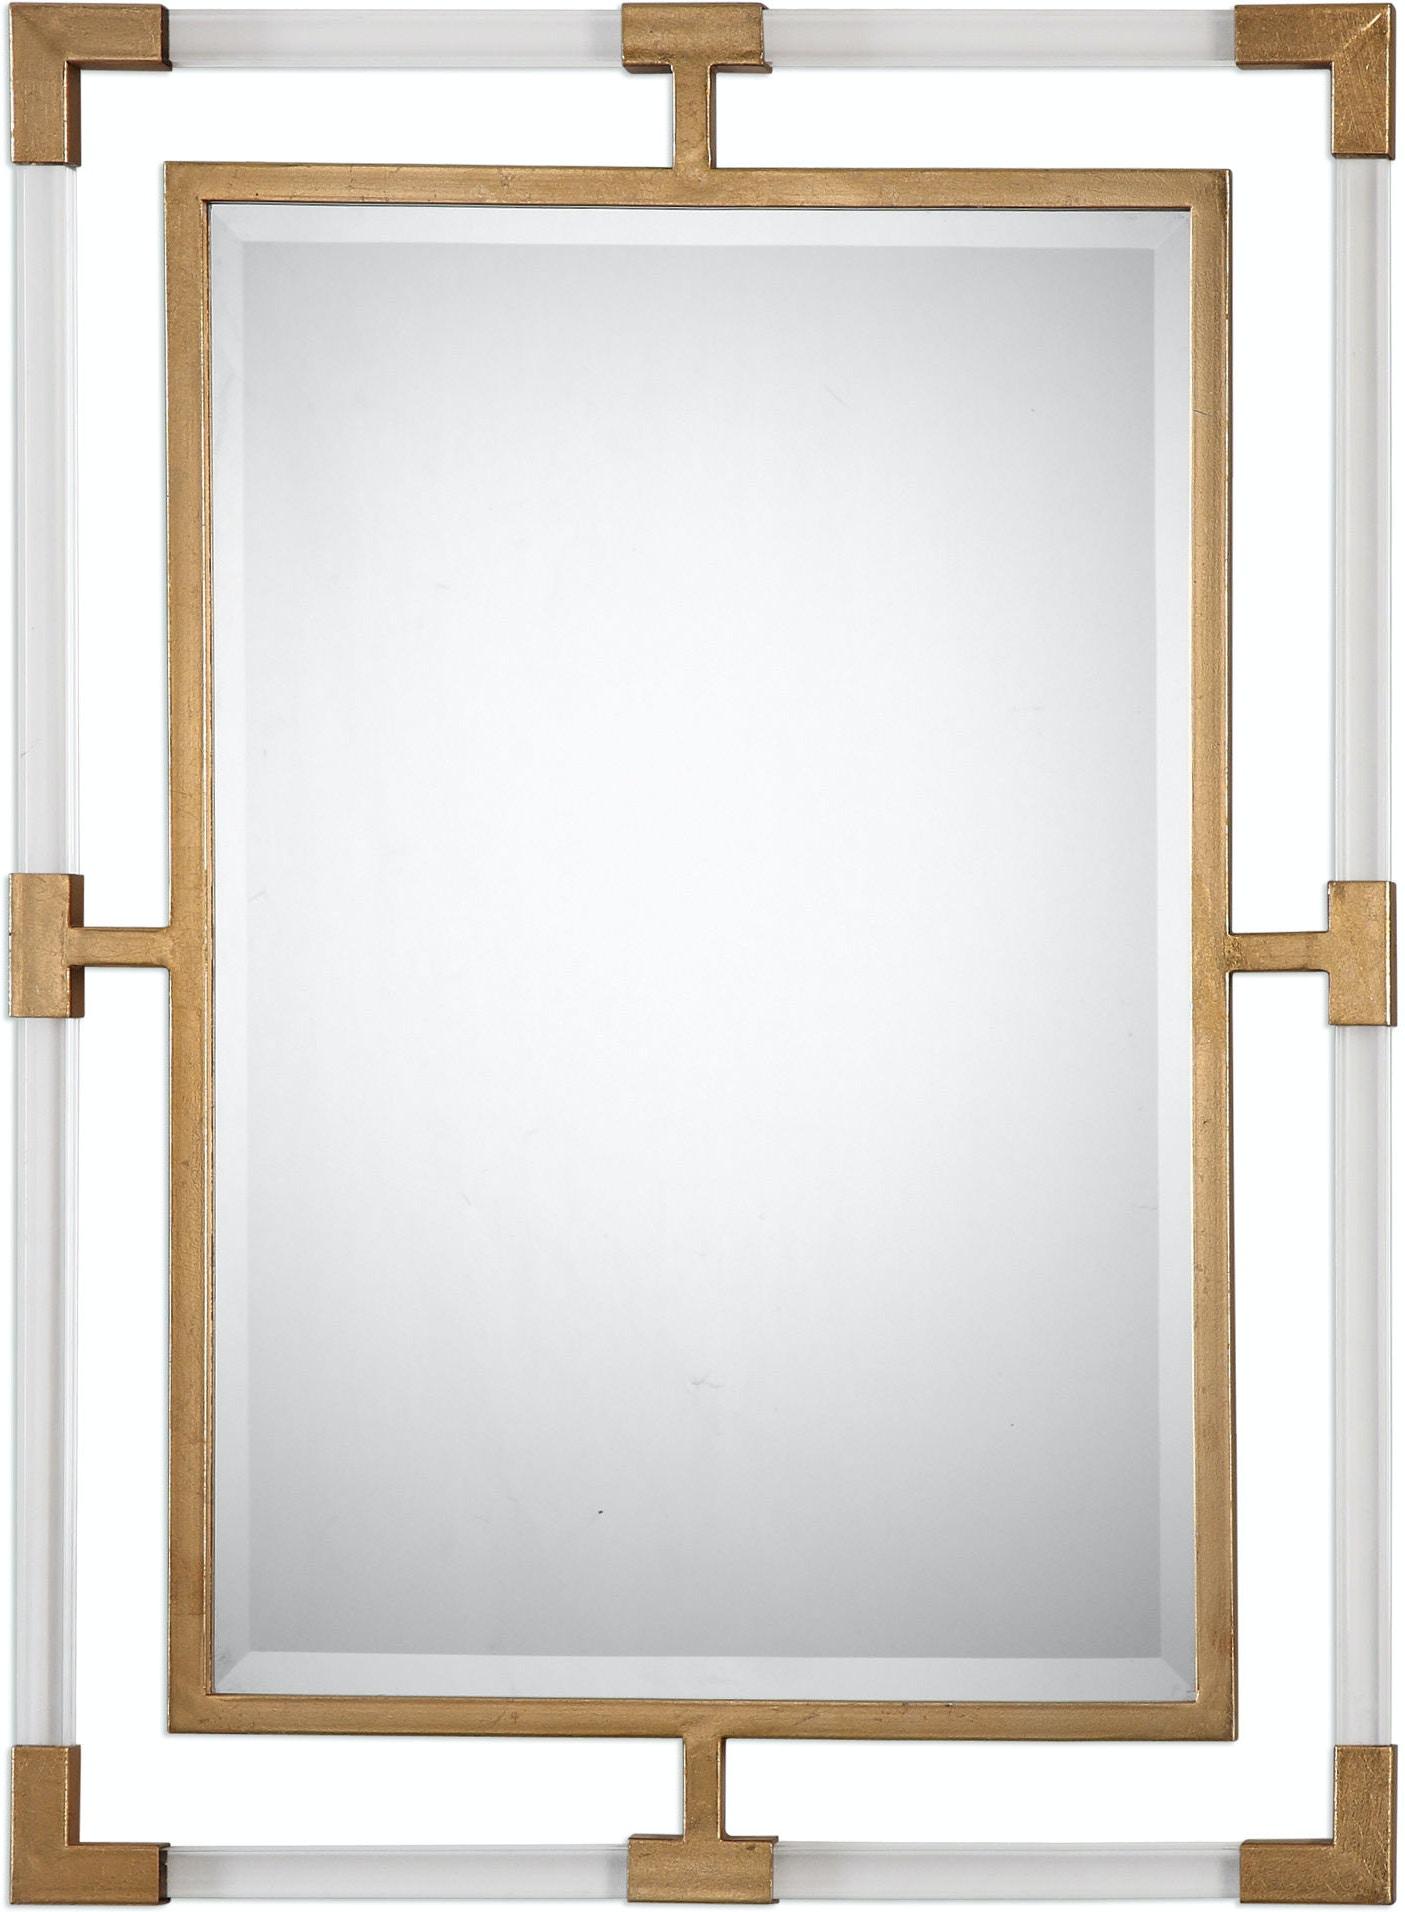 Uttermost Accessories Balkan Modern Gold Wall Mirror 09124 Howard Lorton Furniture Design